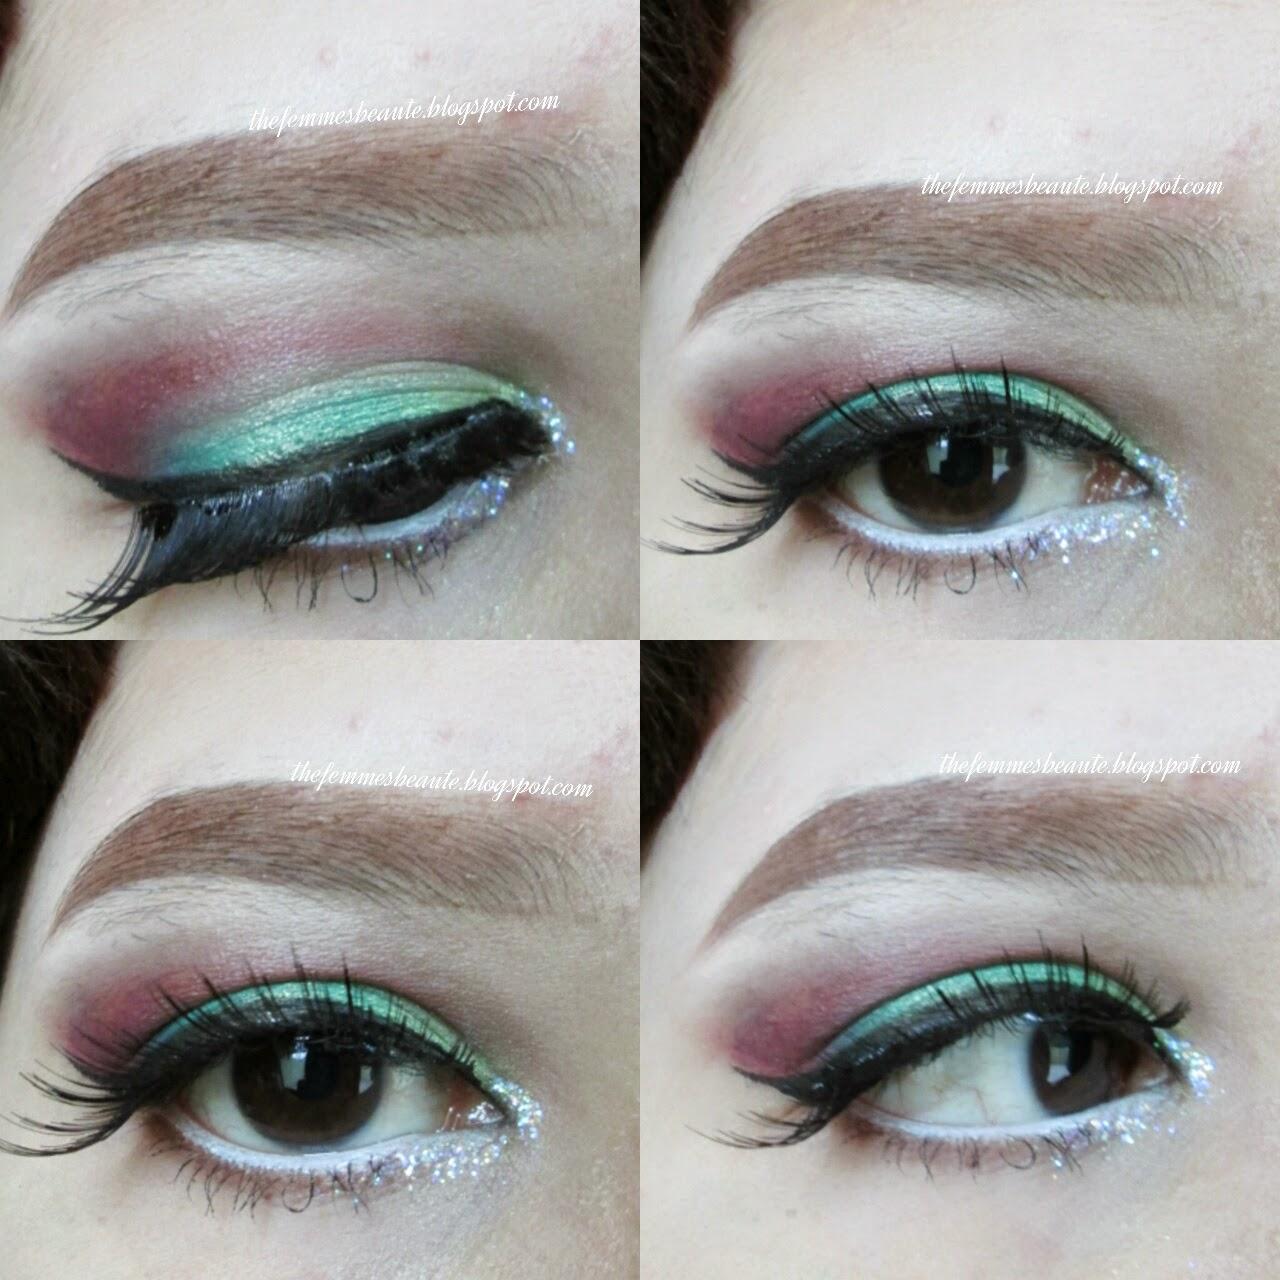 thefemmesbeaute tutorial christmas inspired makeup eotd